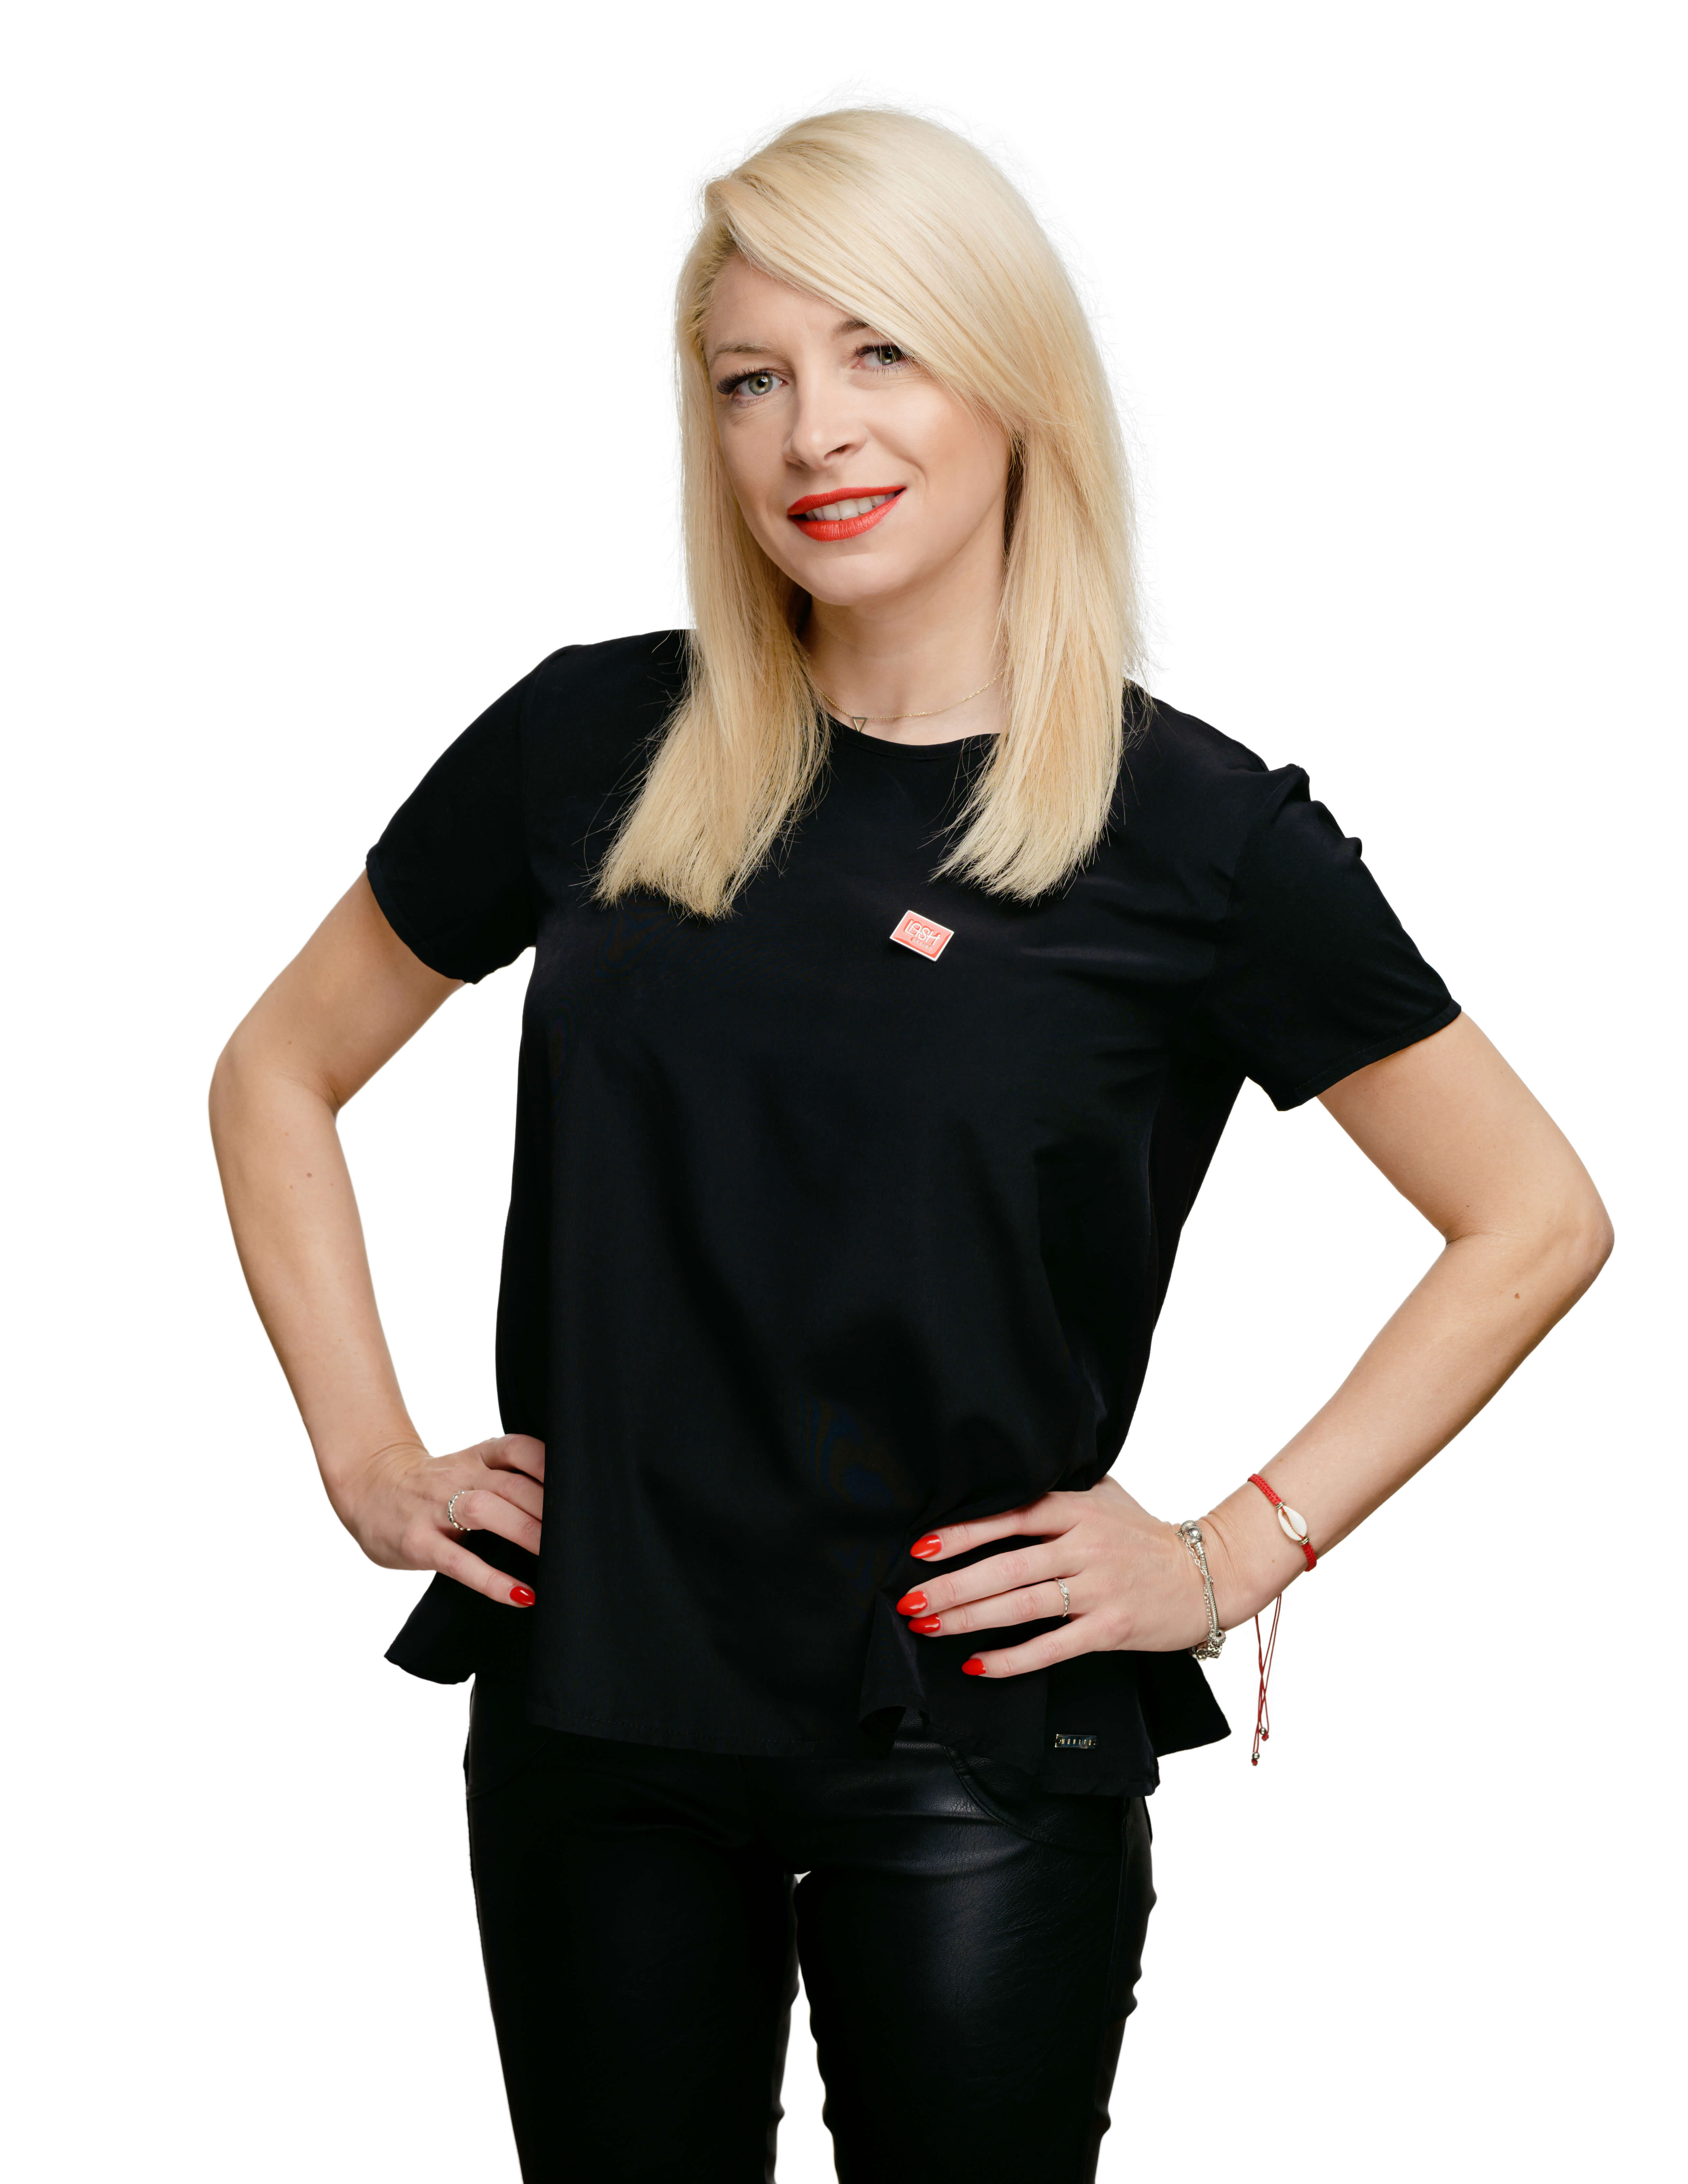 Paulina Kokoryka